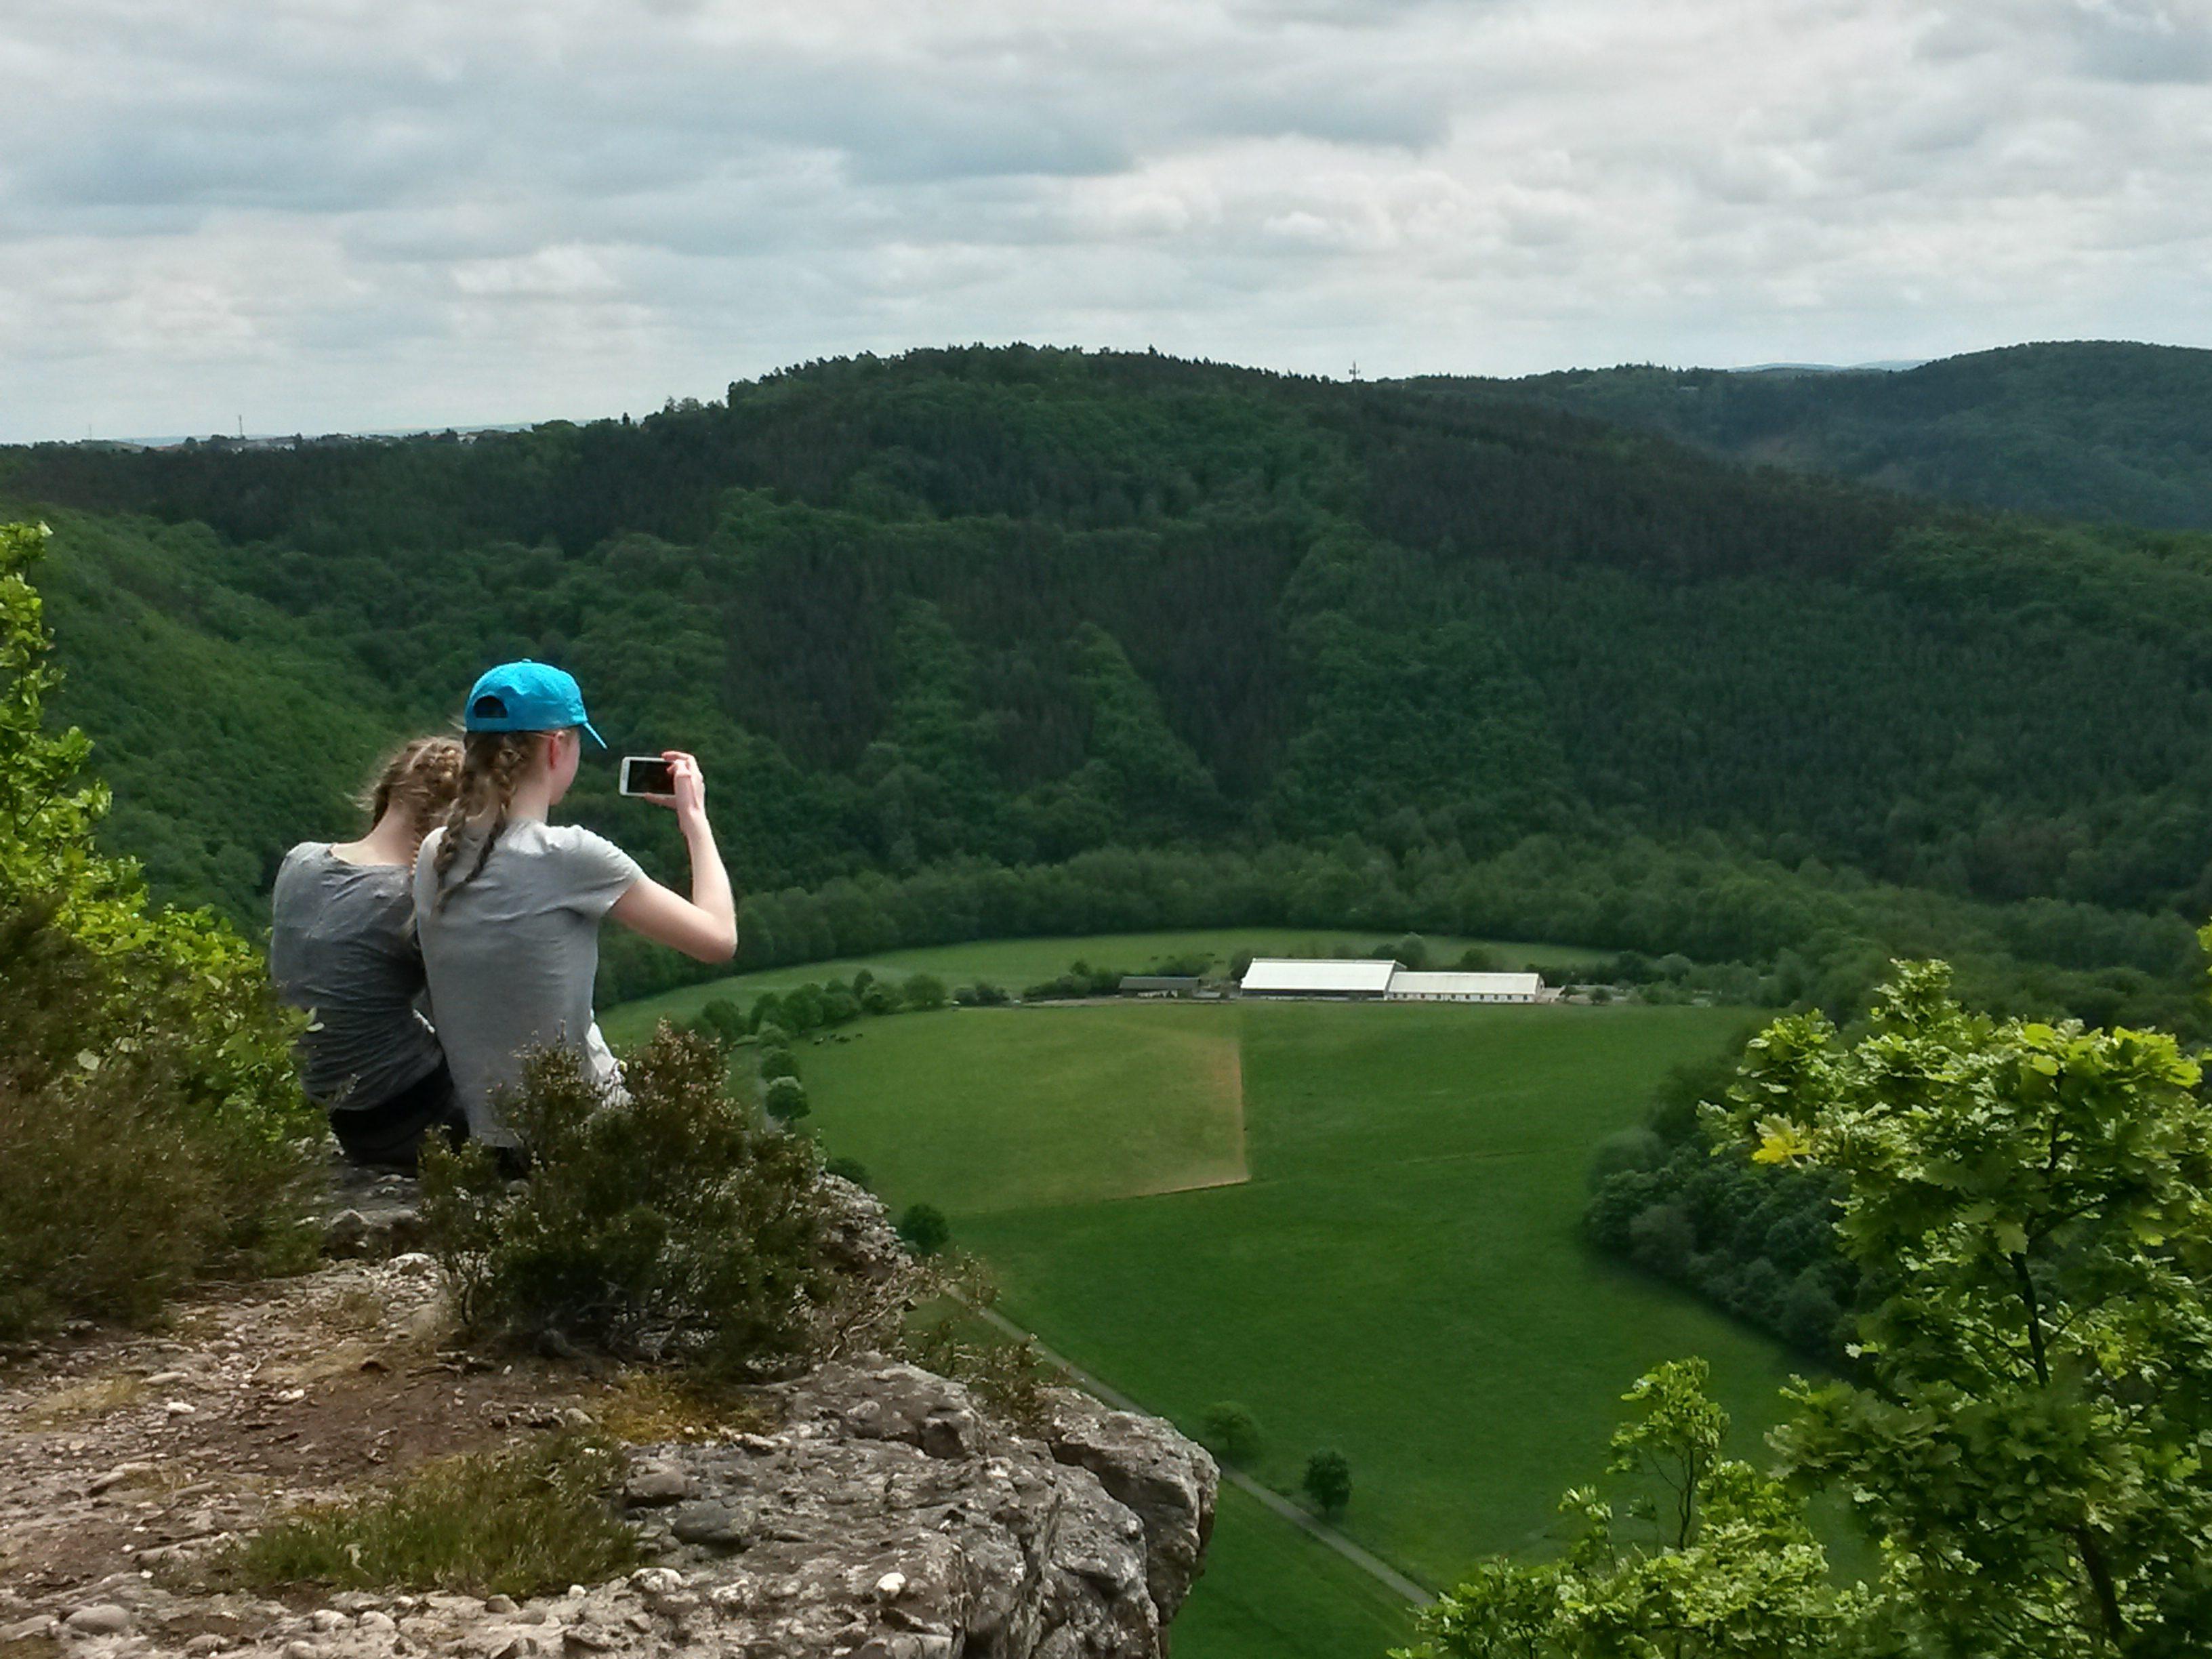 Bergprüfung bestanden – dritte Trainingsetappe der Walking Stones